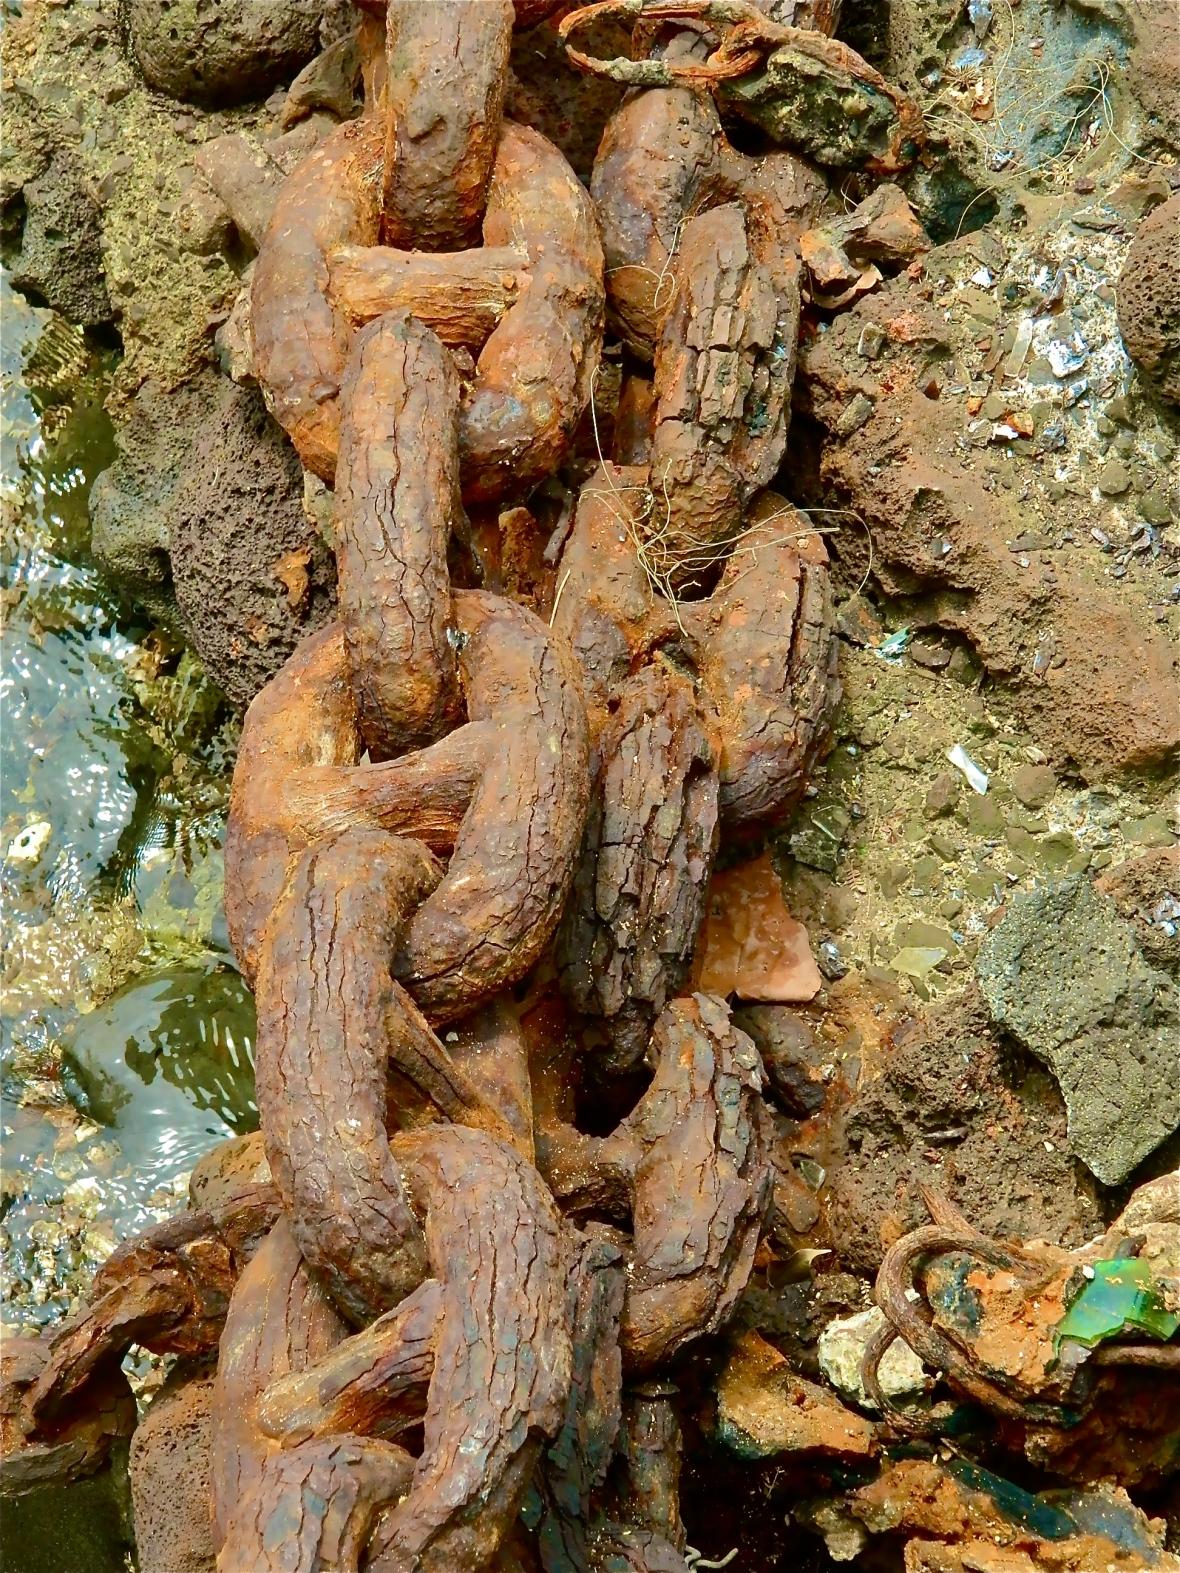 Lahaina Rusty Chain